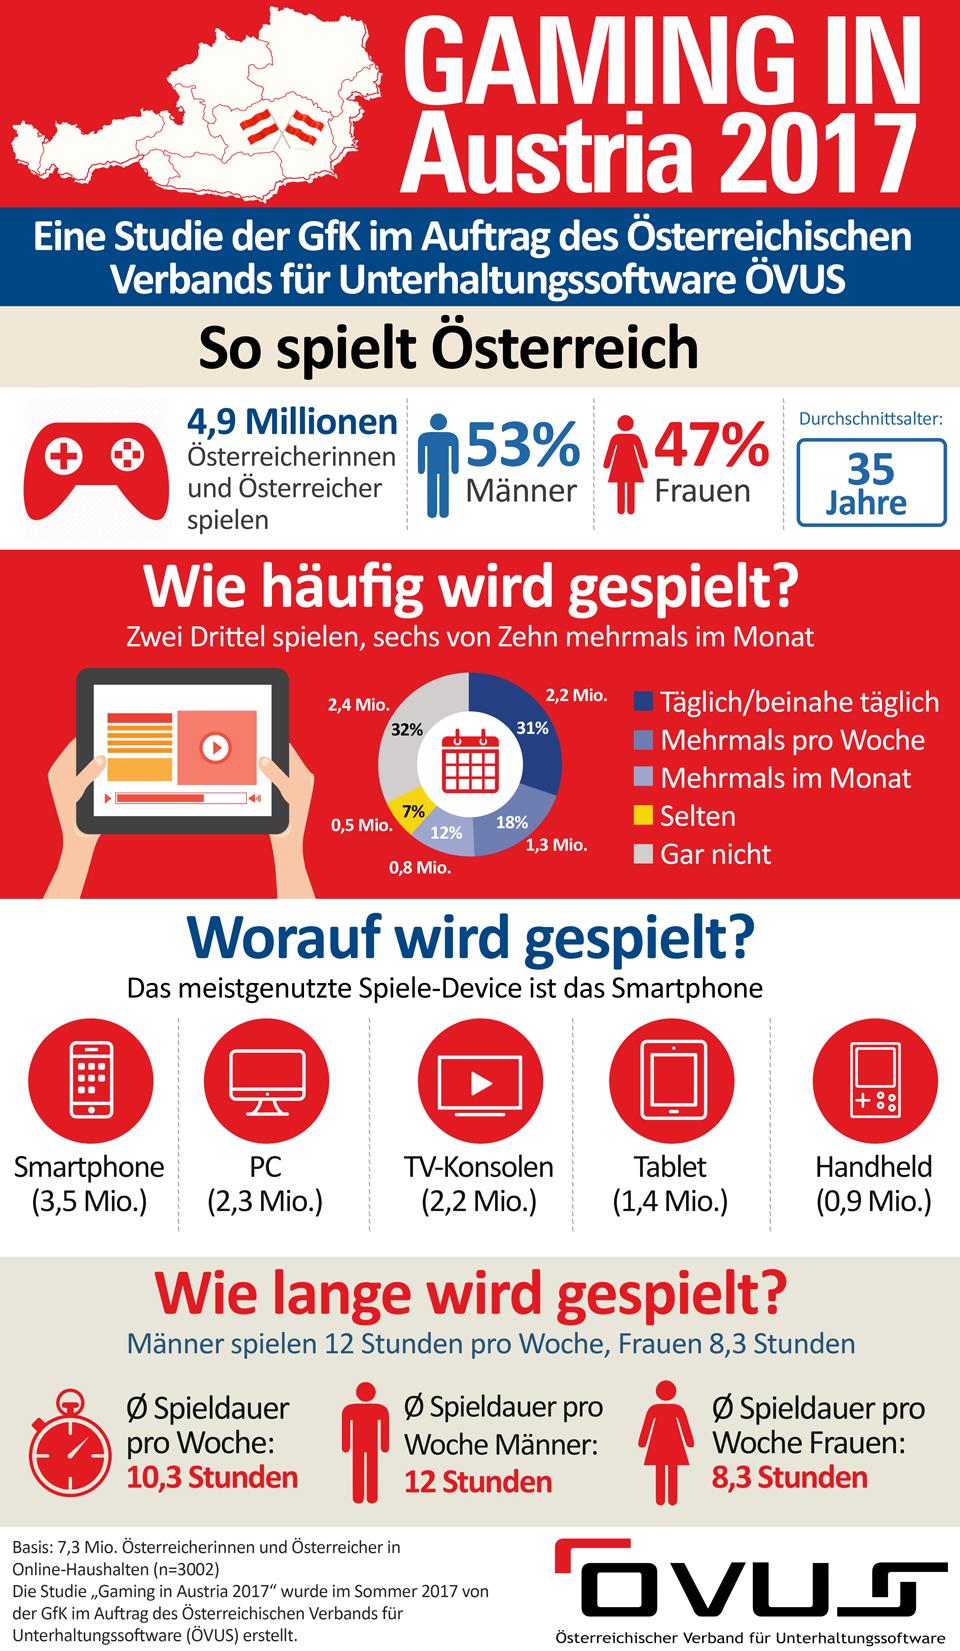 gaming in austria 2017 grafik.jpg